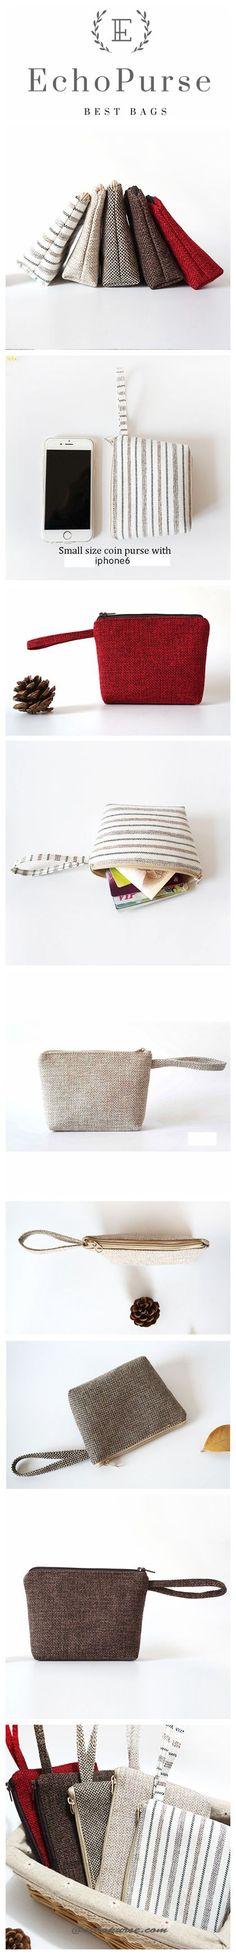 Handmade Simple Wallet, Canvas Zip Coin Purse, Small Card Wallet, Coin Pouch, Handbags BB065-1